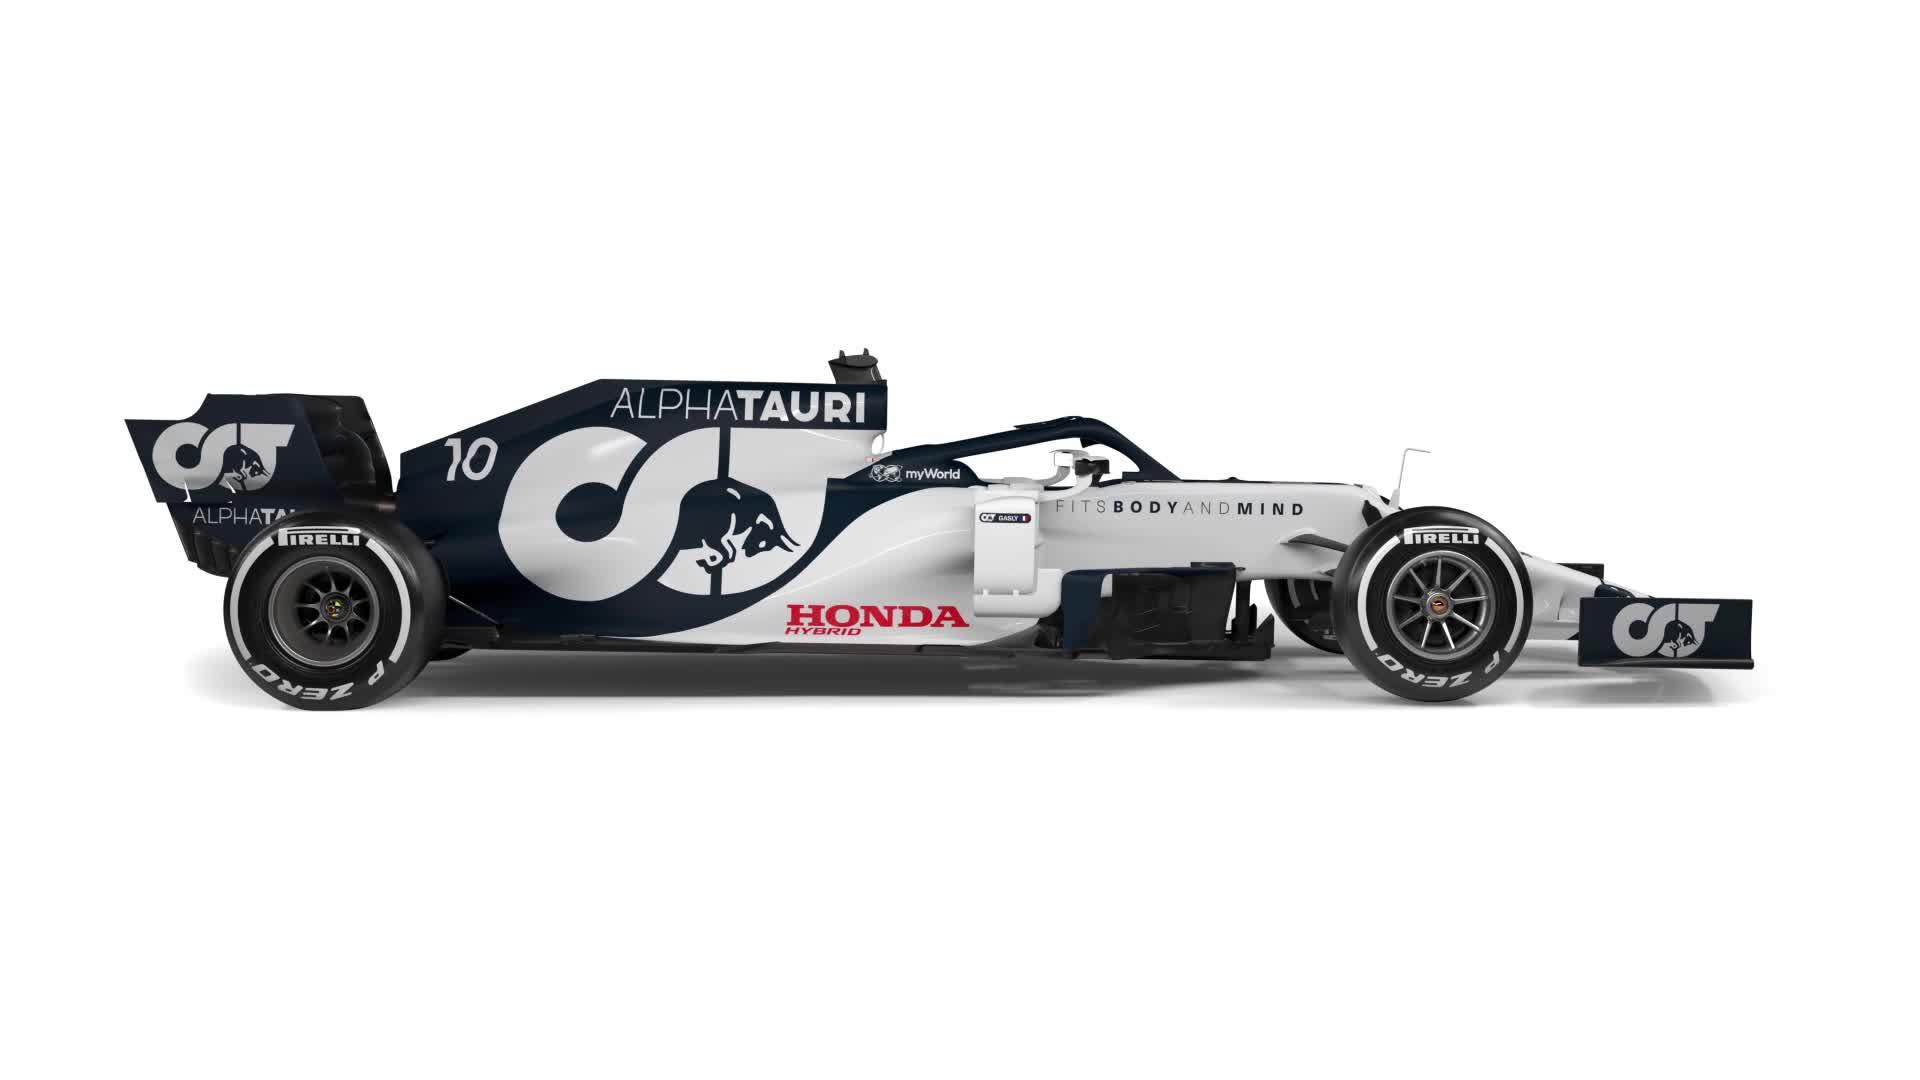 2020 Alpha Tauri compared with 2019 Toro Rosso